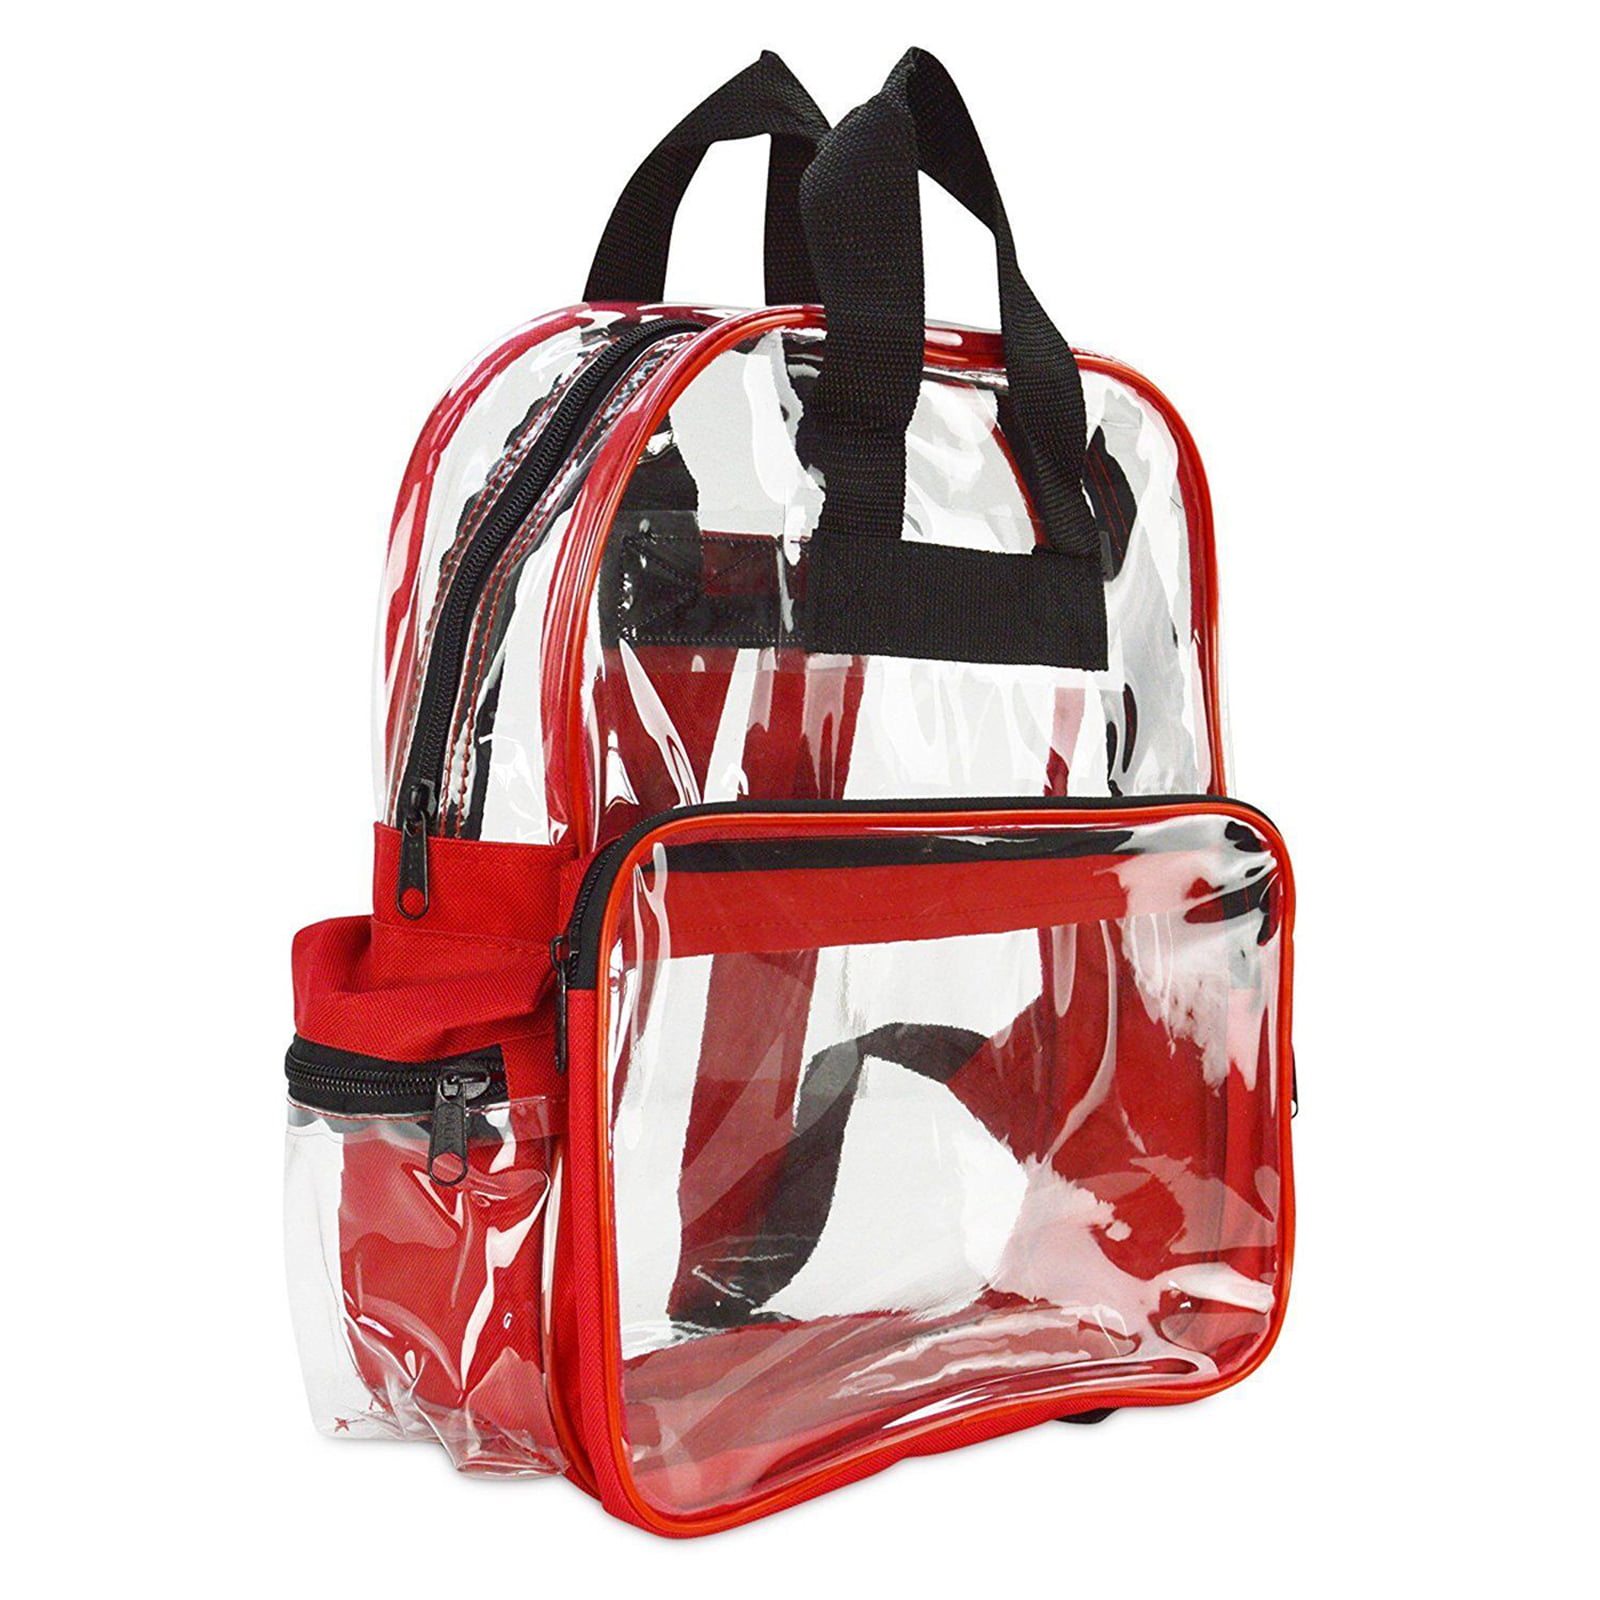 Clear Backpack Transparent Luminous Bookbag Large knapsack See Through Daypack